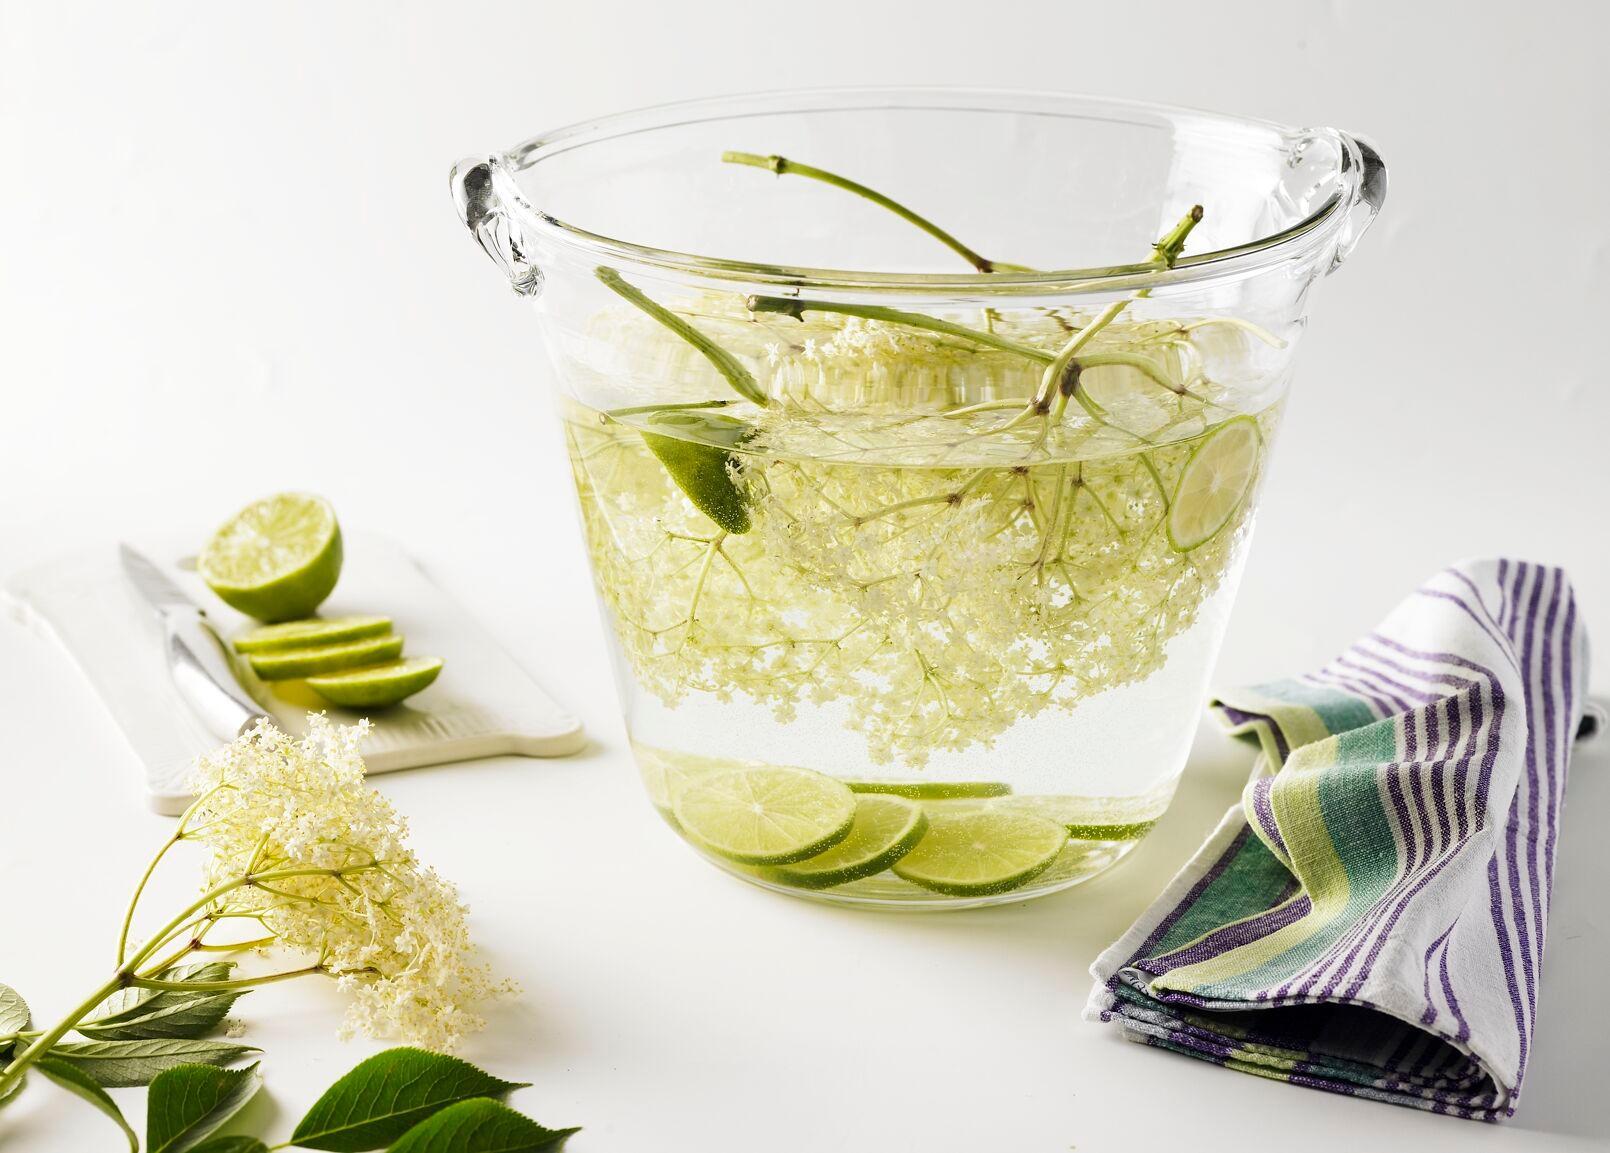 rezepte limonade selber machen herrlich spritzig. Black Bedroom Furniture Sets. Home Design Ideas